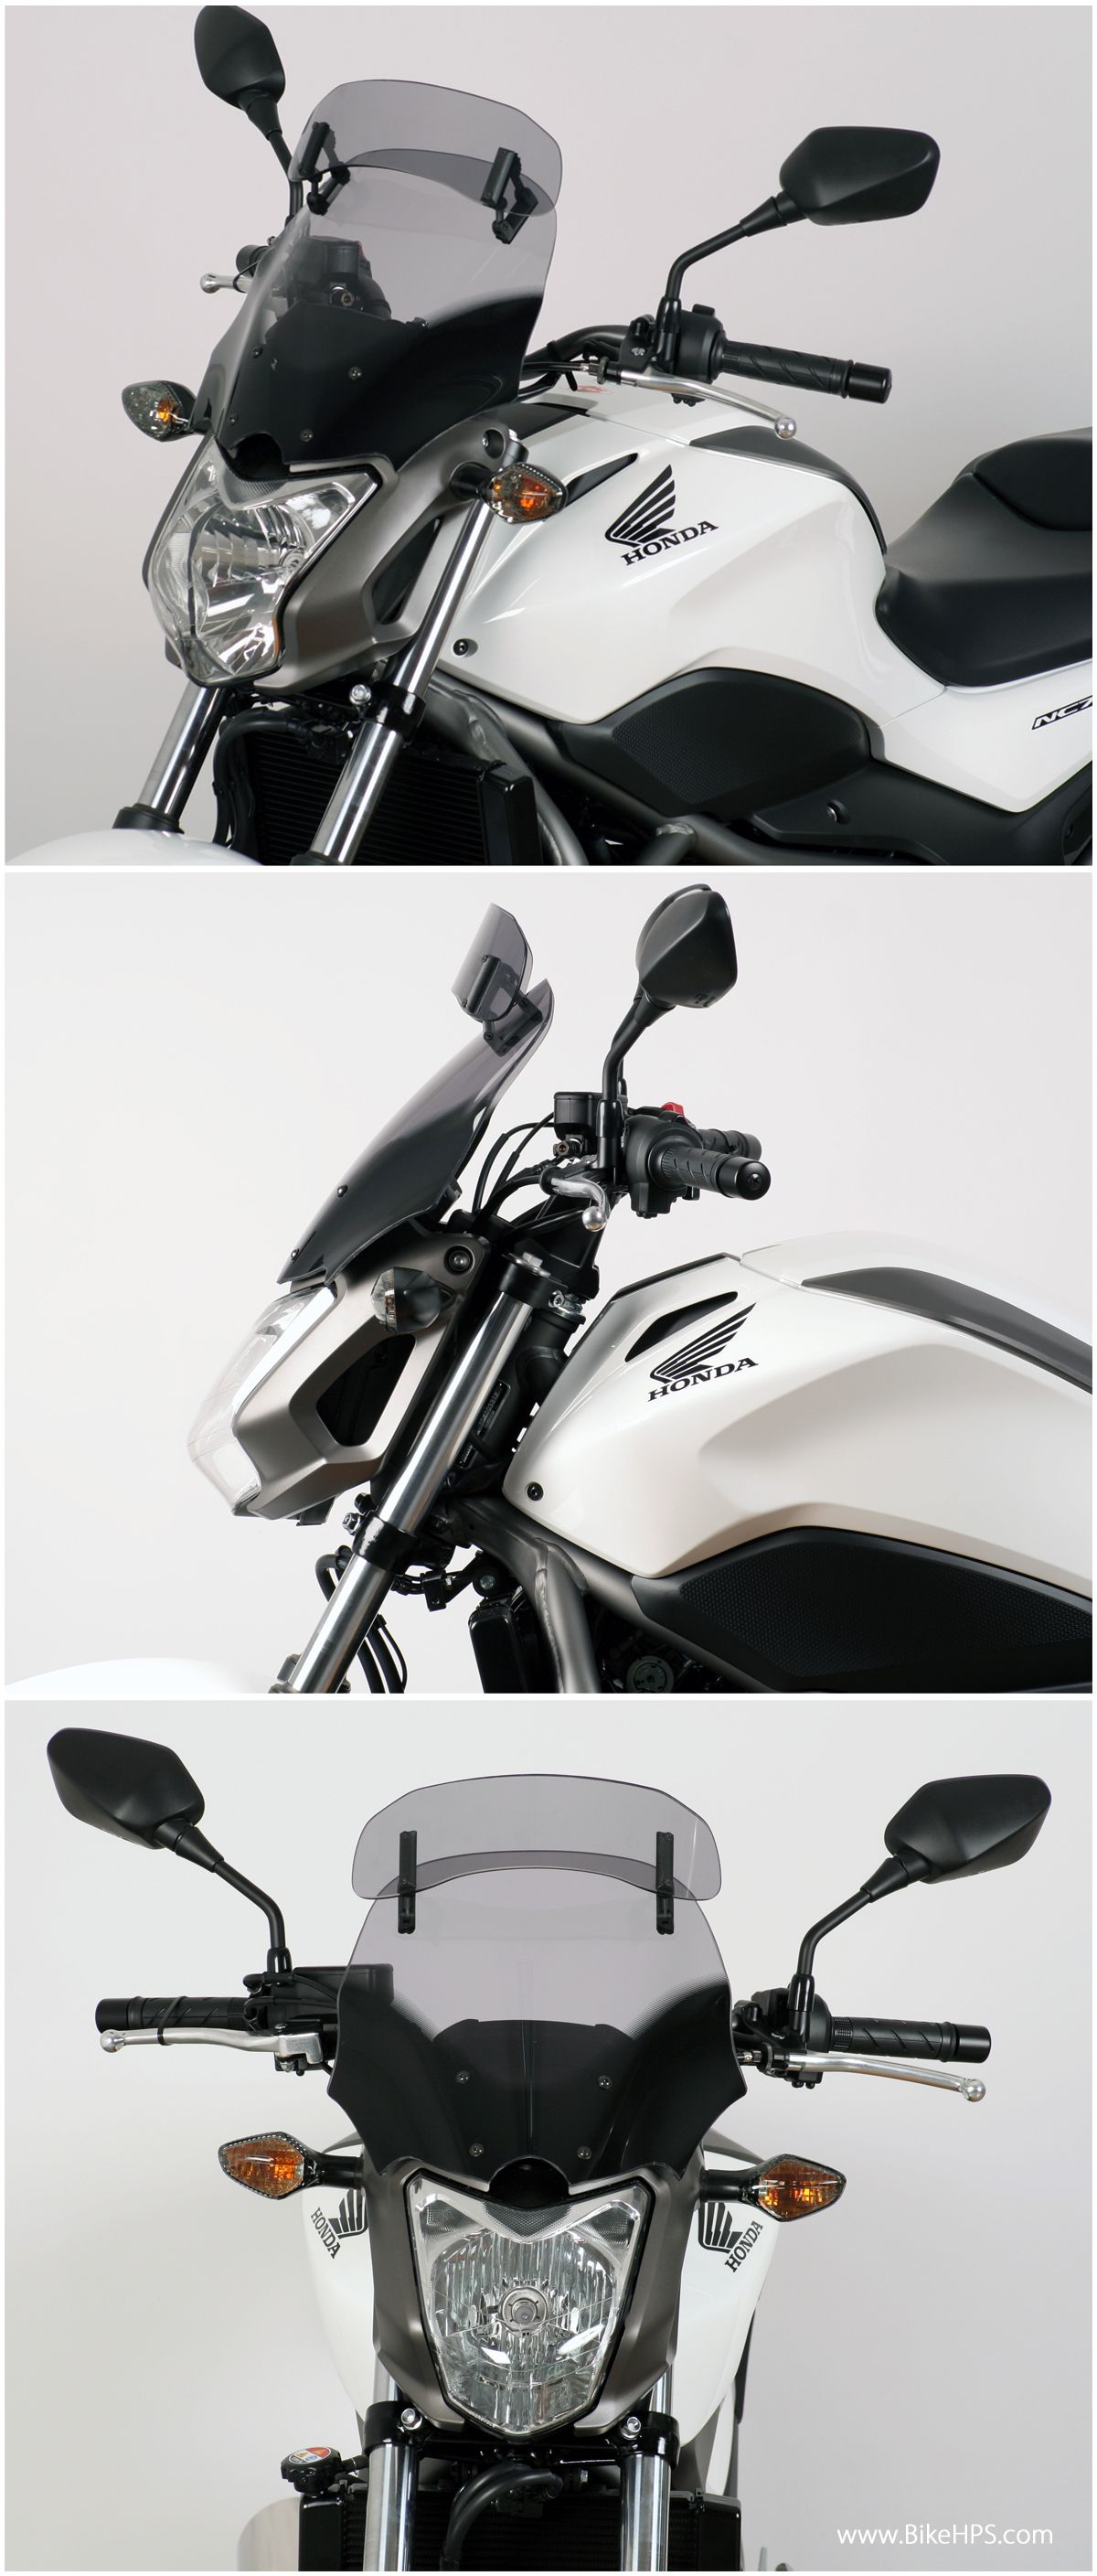 Harwood Performance Source Ltd Motorcycle, Moto bike